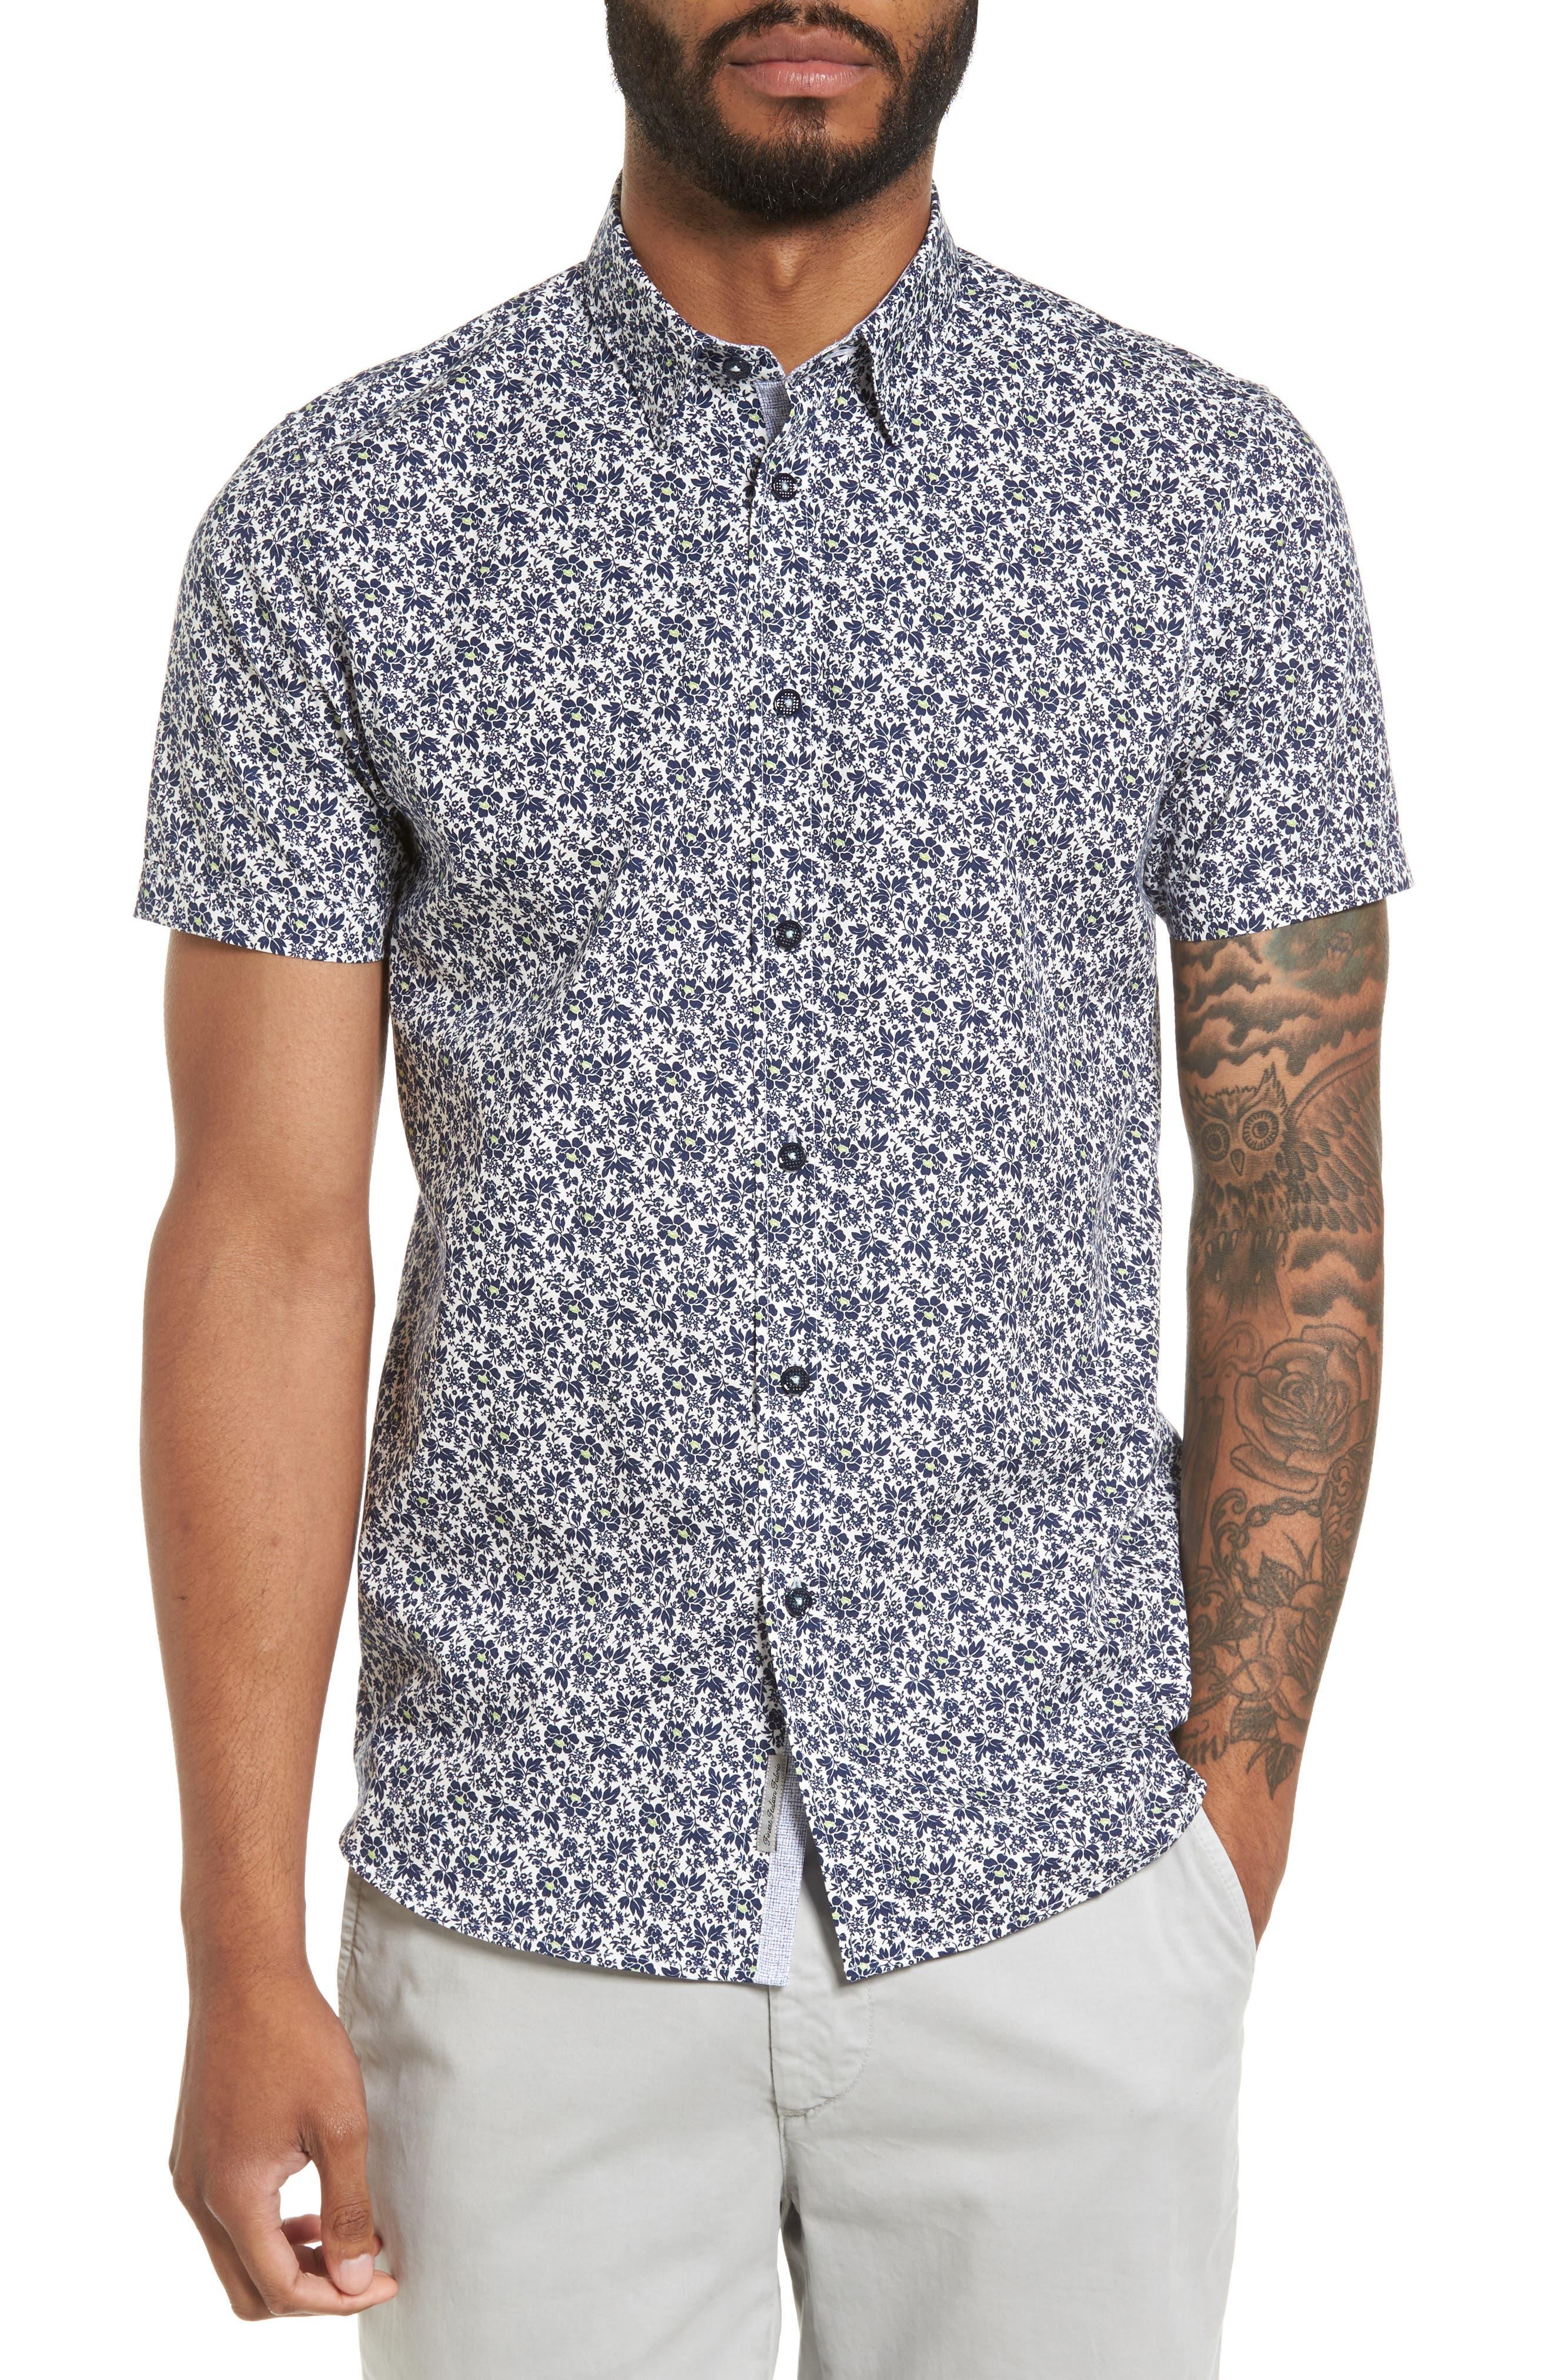 Alygar Slim Fit Floral Woven Shirt,                             Main thumbnail 1, color,                             402